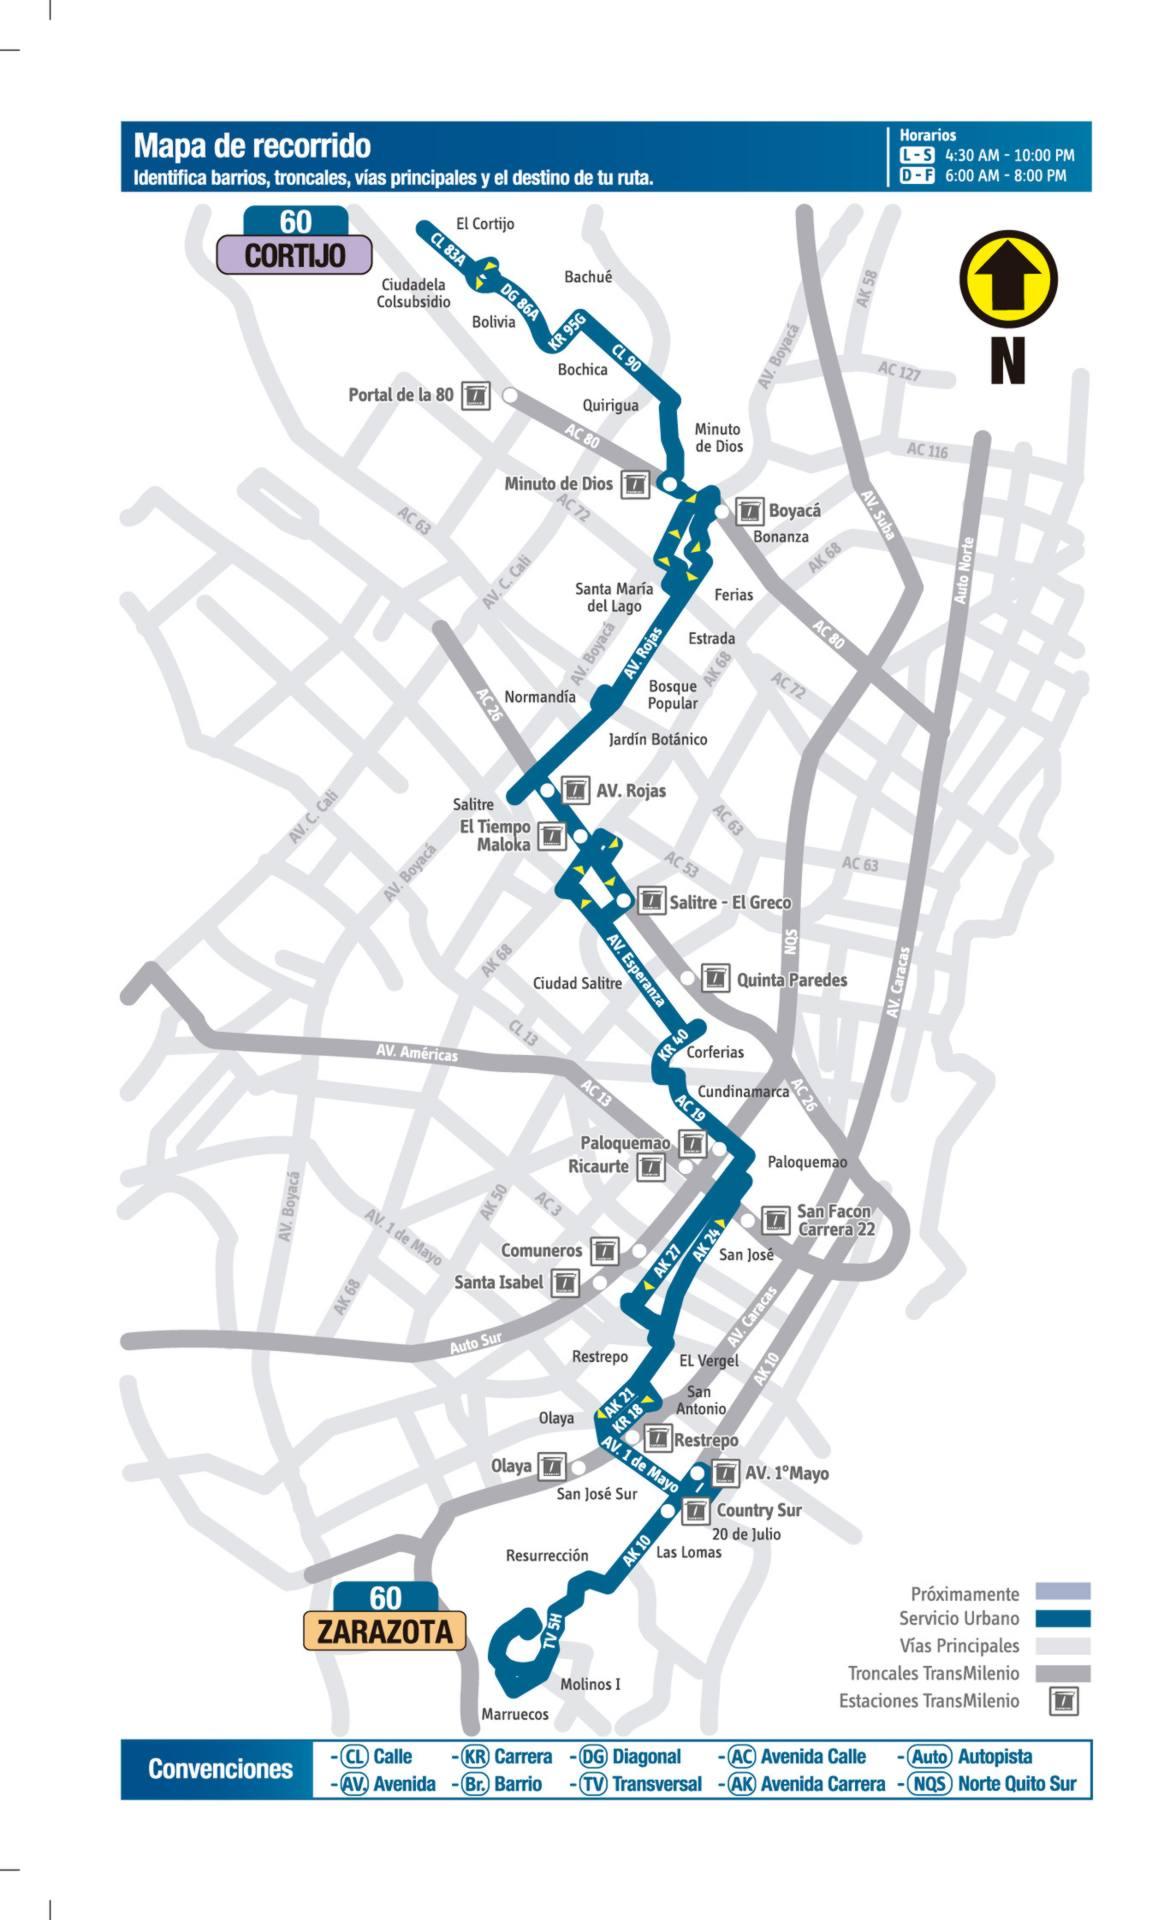 60_mapa_urbana_sitp_2016_optimized